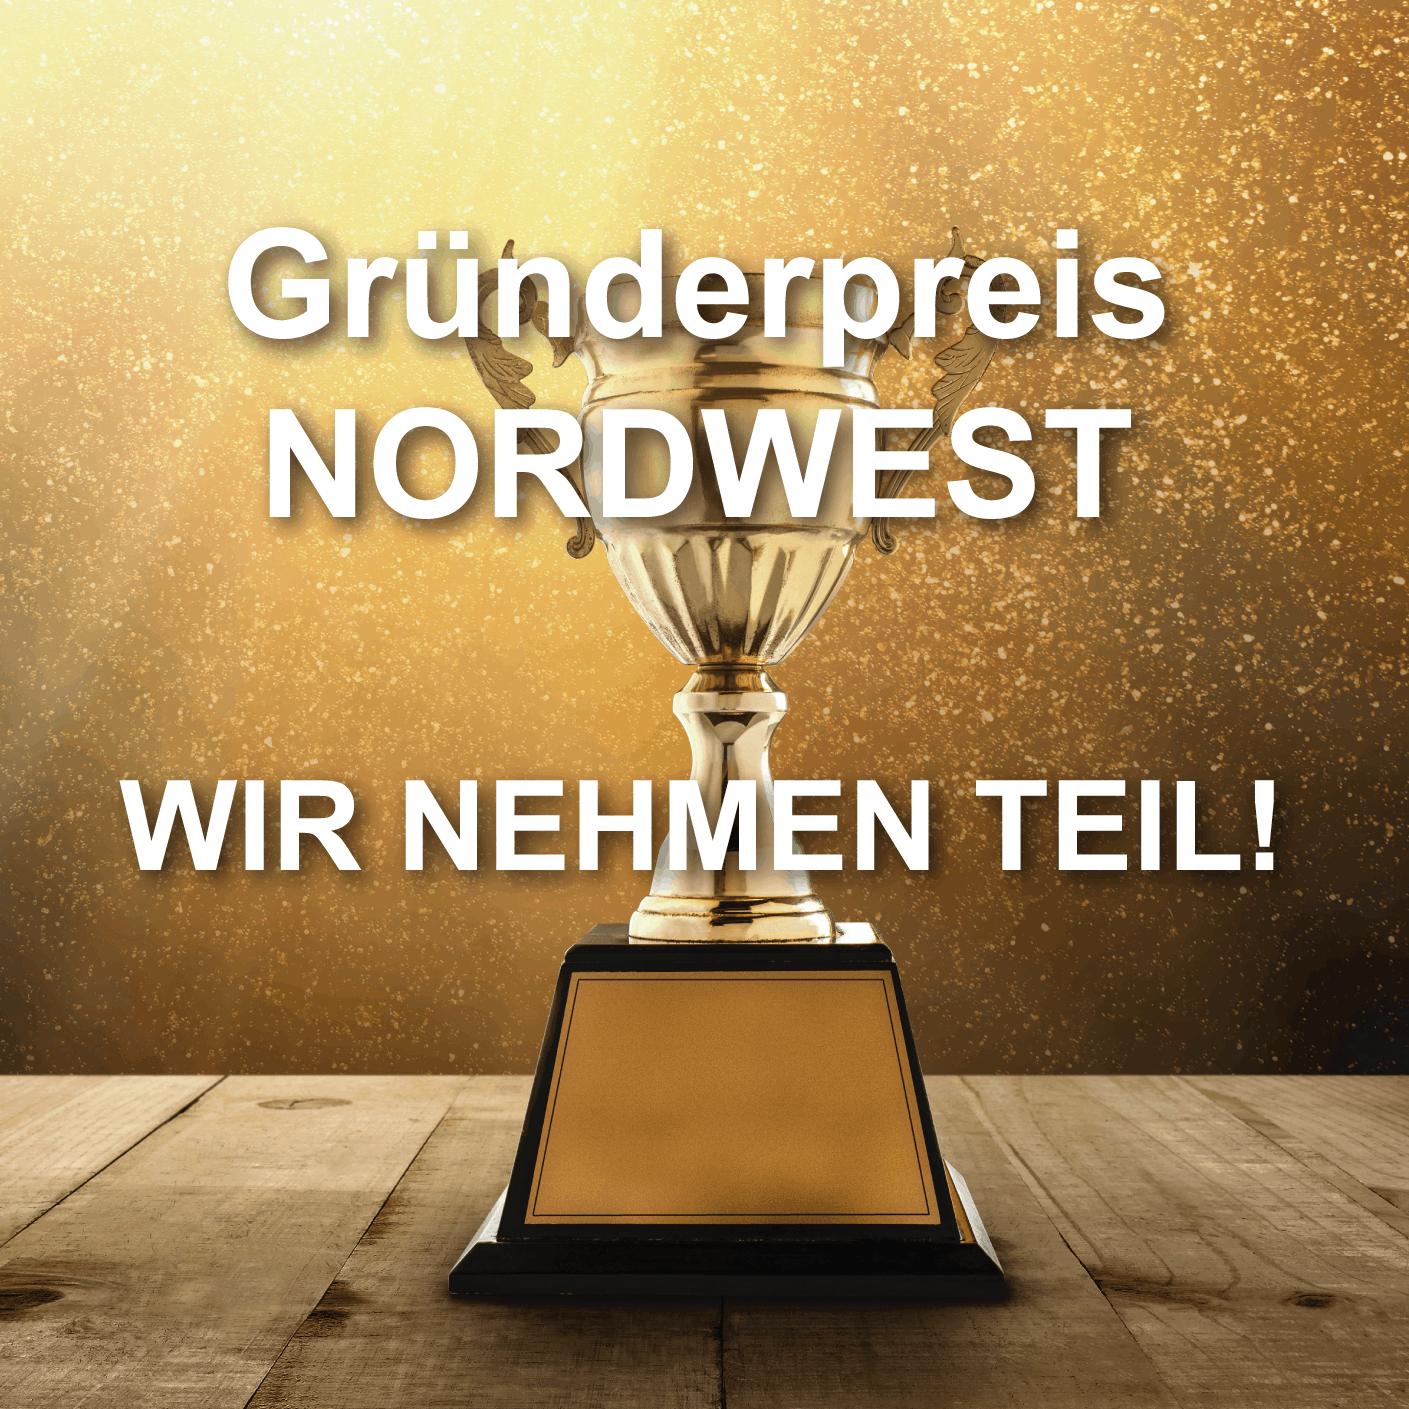 Lend-Grand - Gründer Preis NordWest - Wir nehmen teil